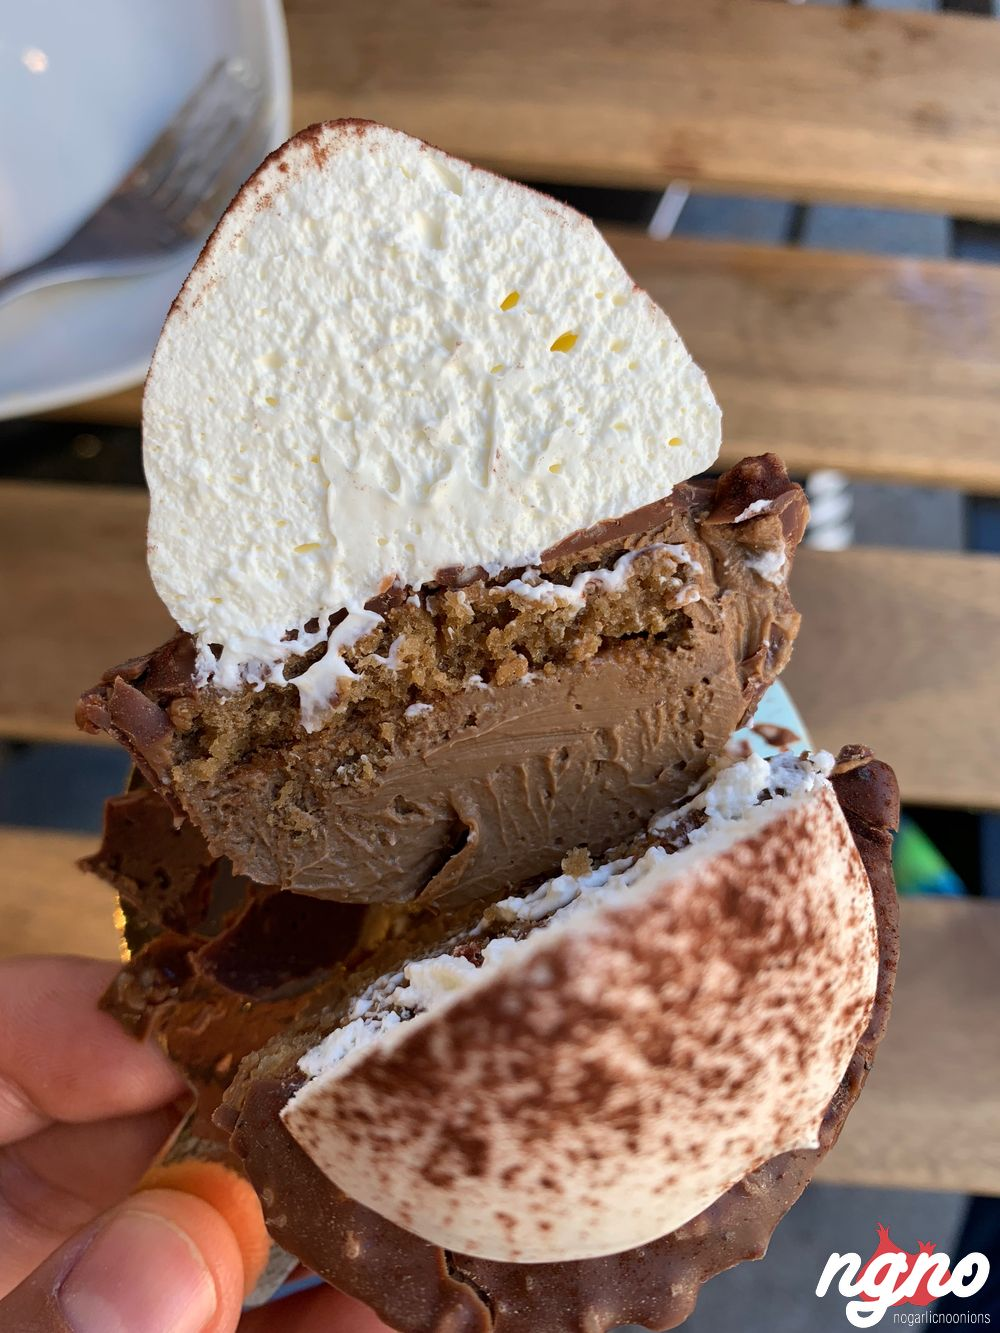 bo-mie-bakery-pastry-paris-nogarlicnoonions-32018-10-13-06-47-25